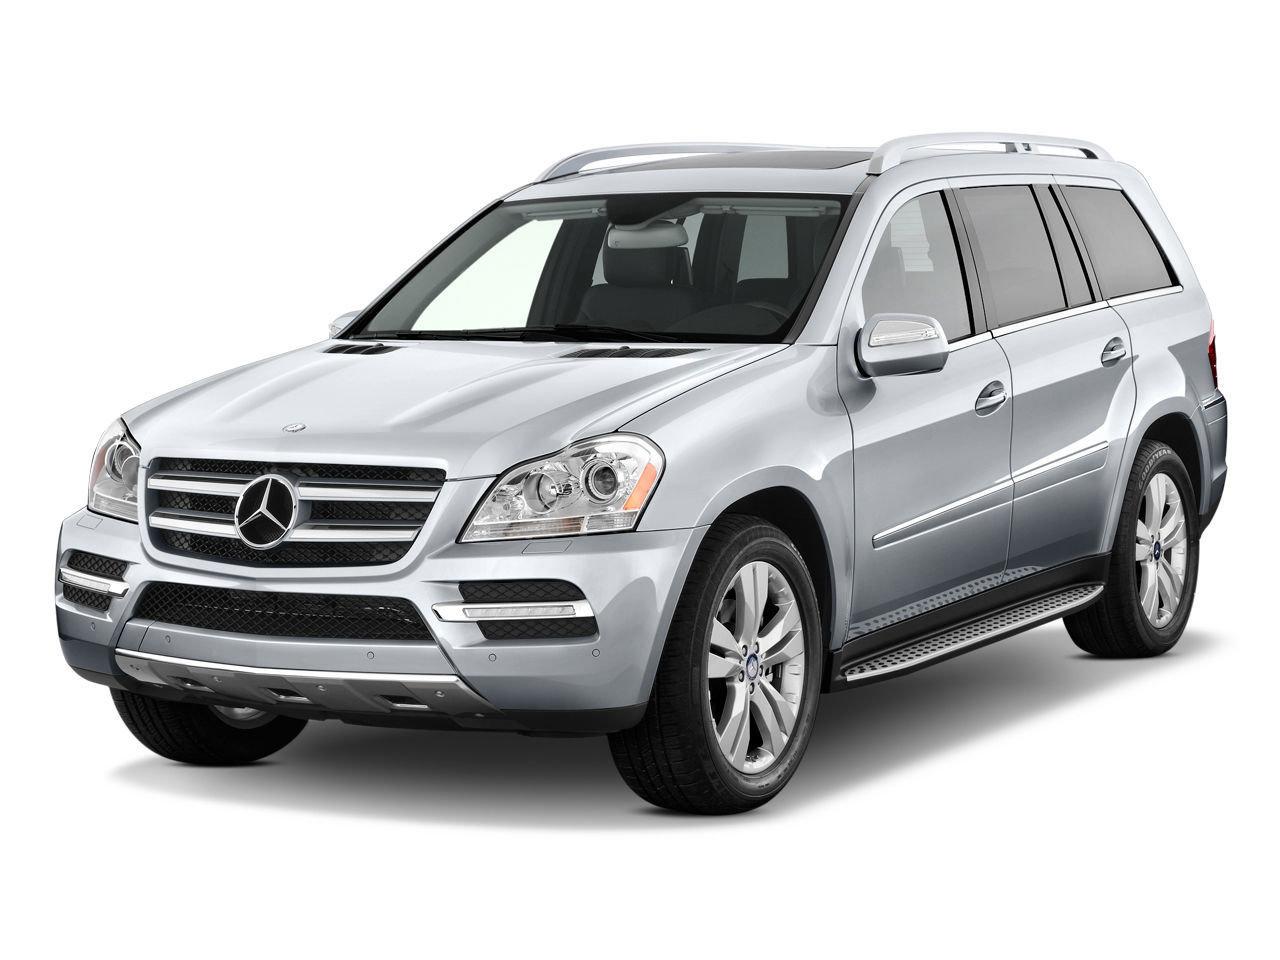 Mercedes GL320CDI X164 3.2CDI EDC16CP31 1037386938